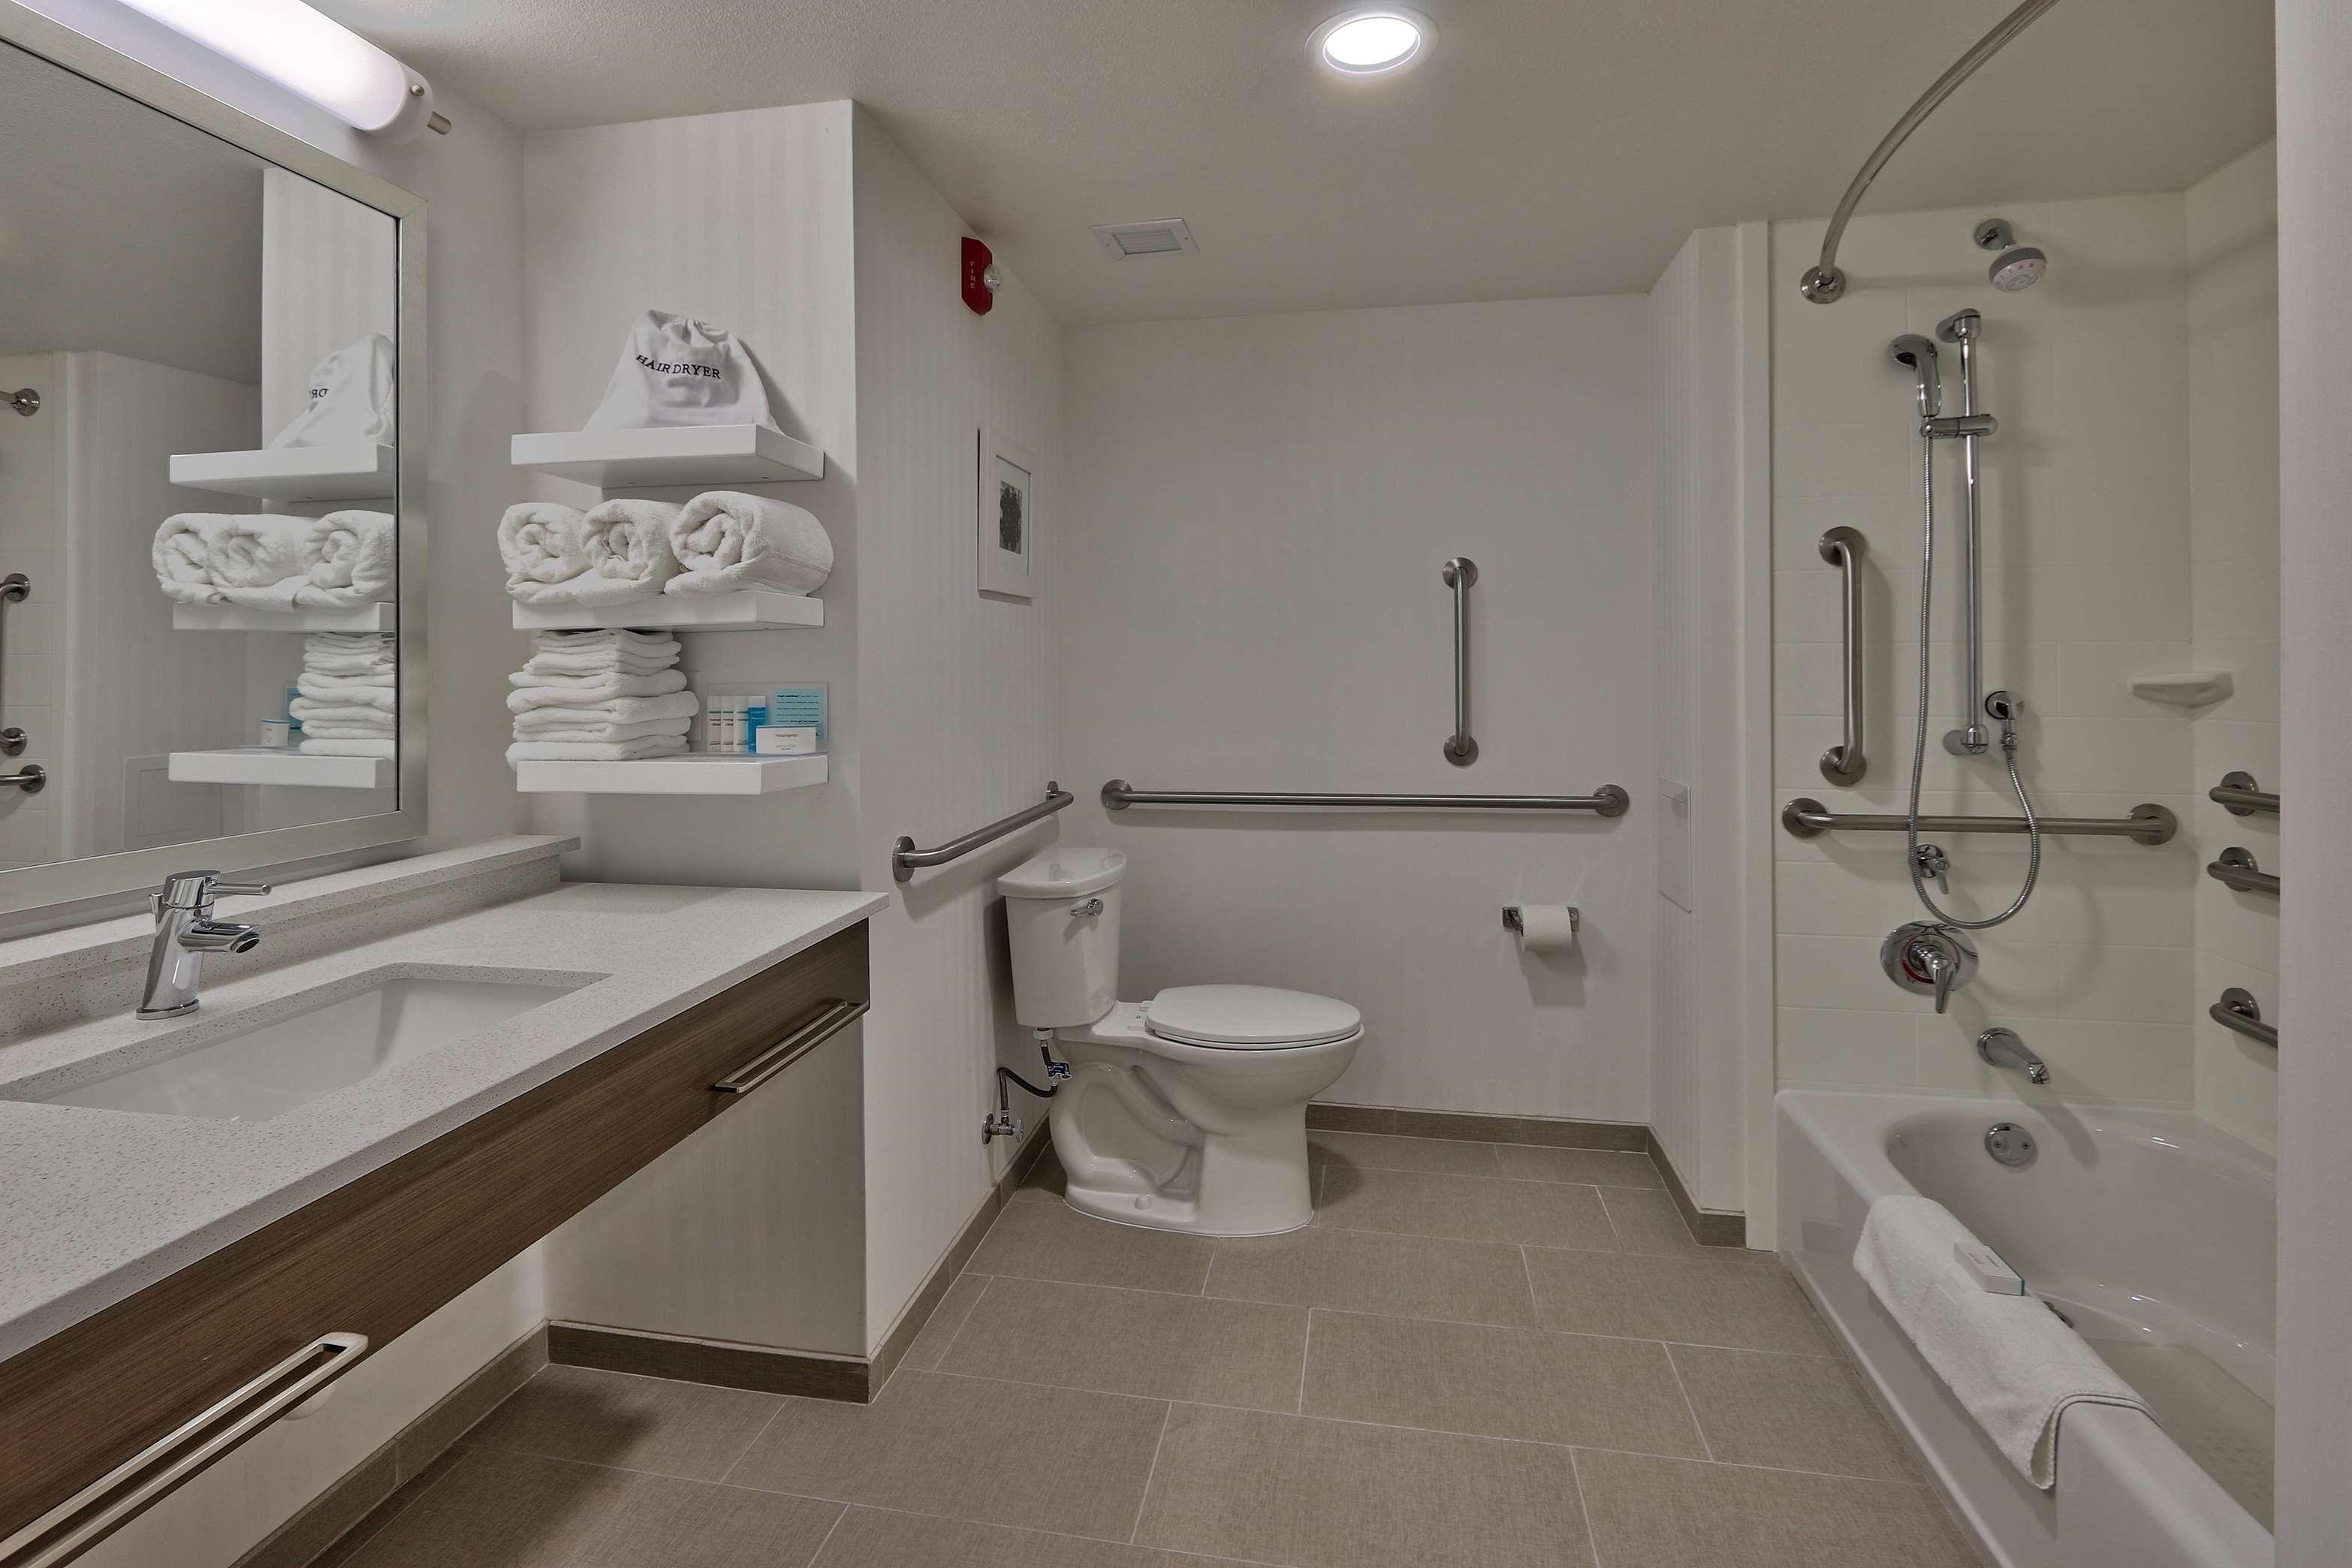 Hampton Inn & Suites Artesia image 3